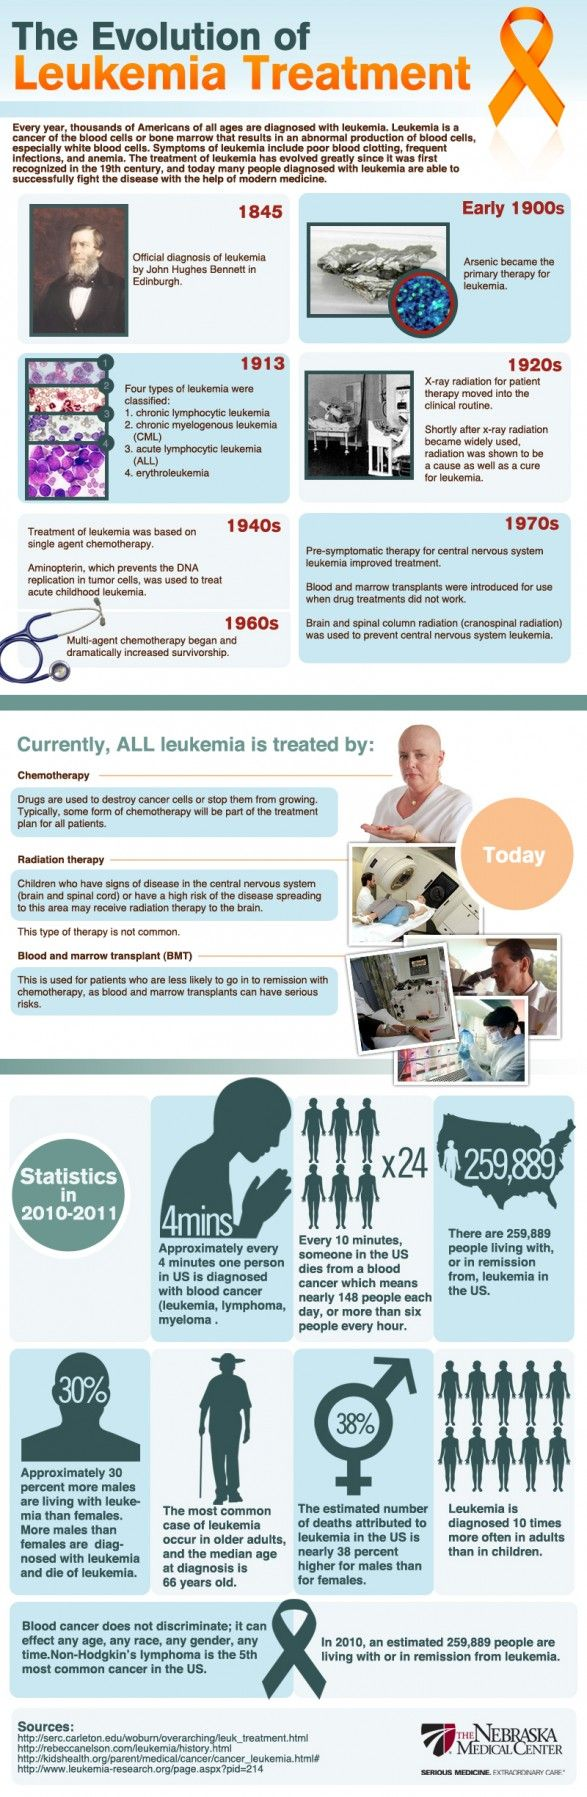 The Evolution of Leukemia Treatment #cureleukemia